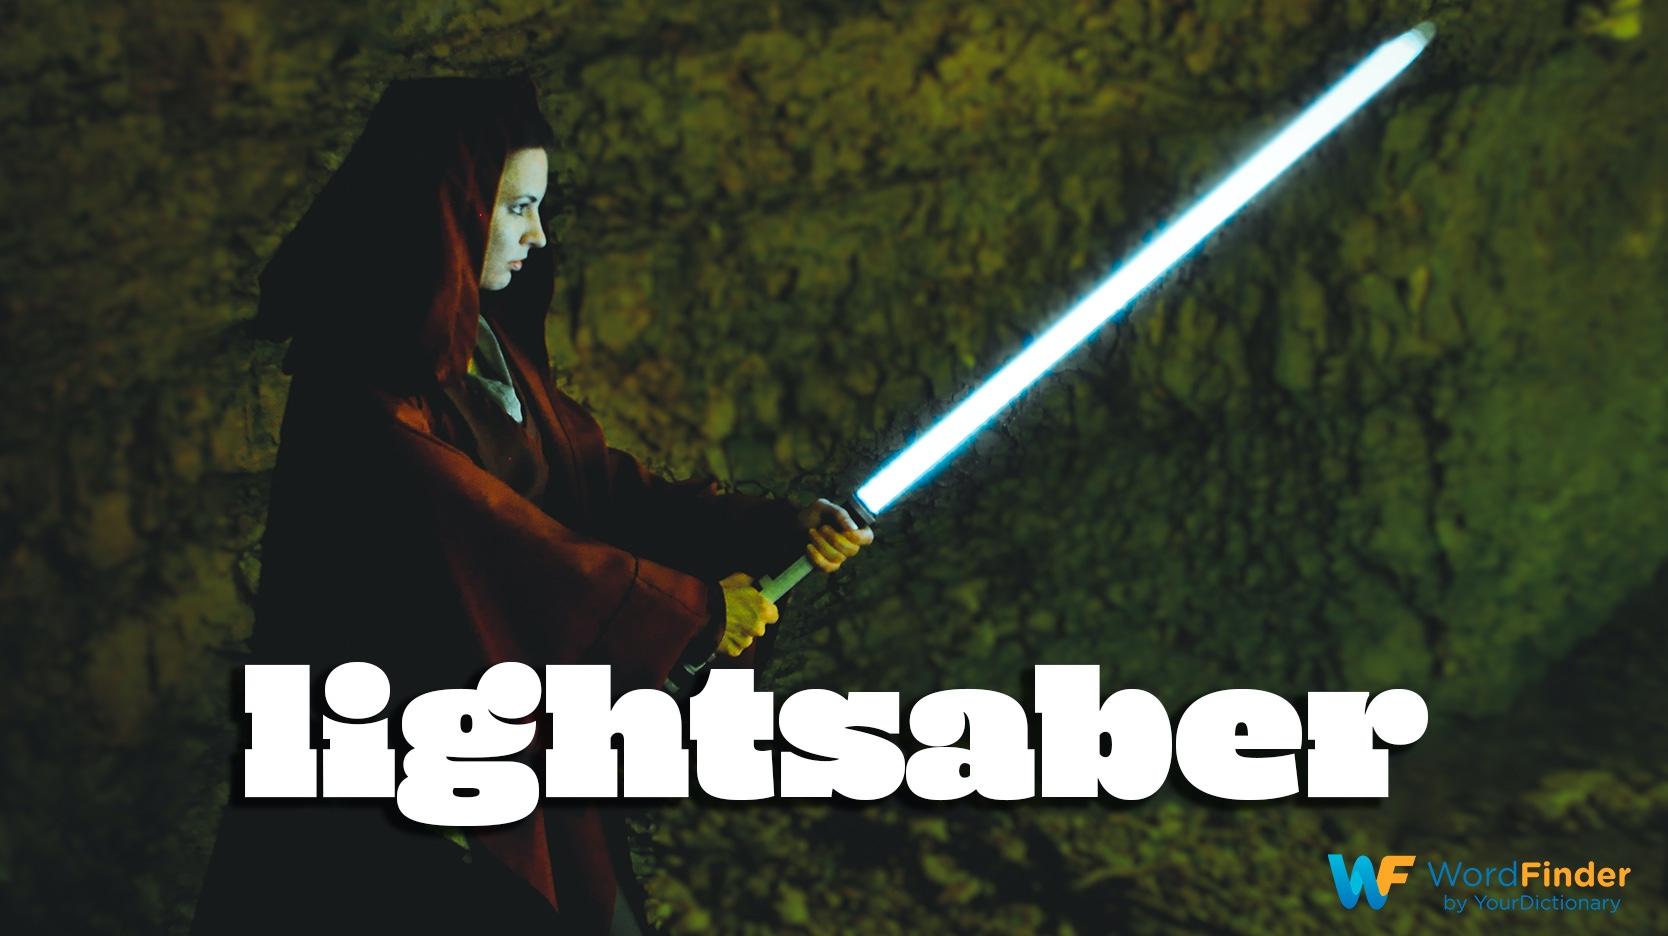 made up word lightsaber